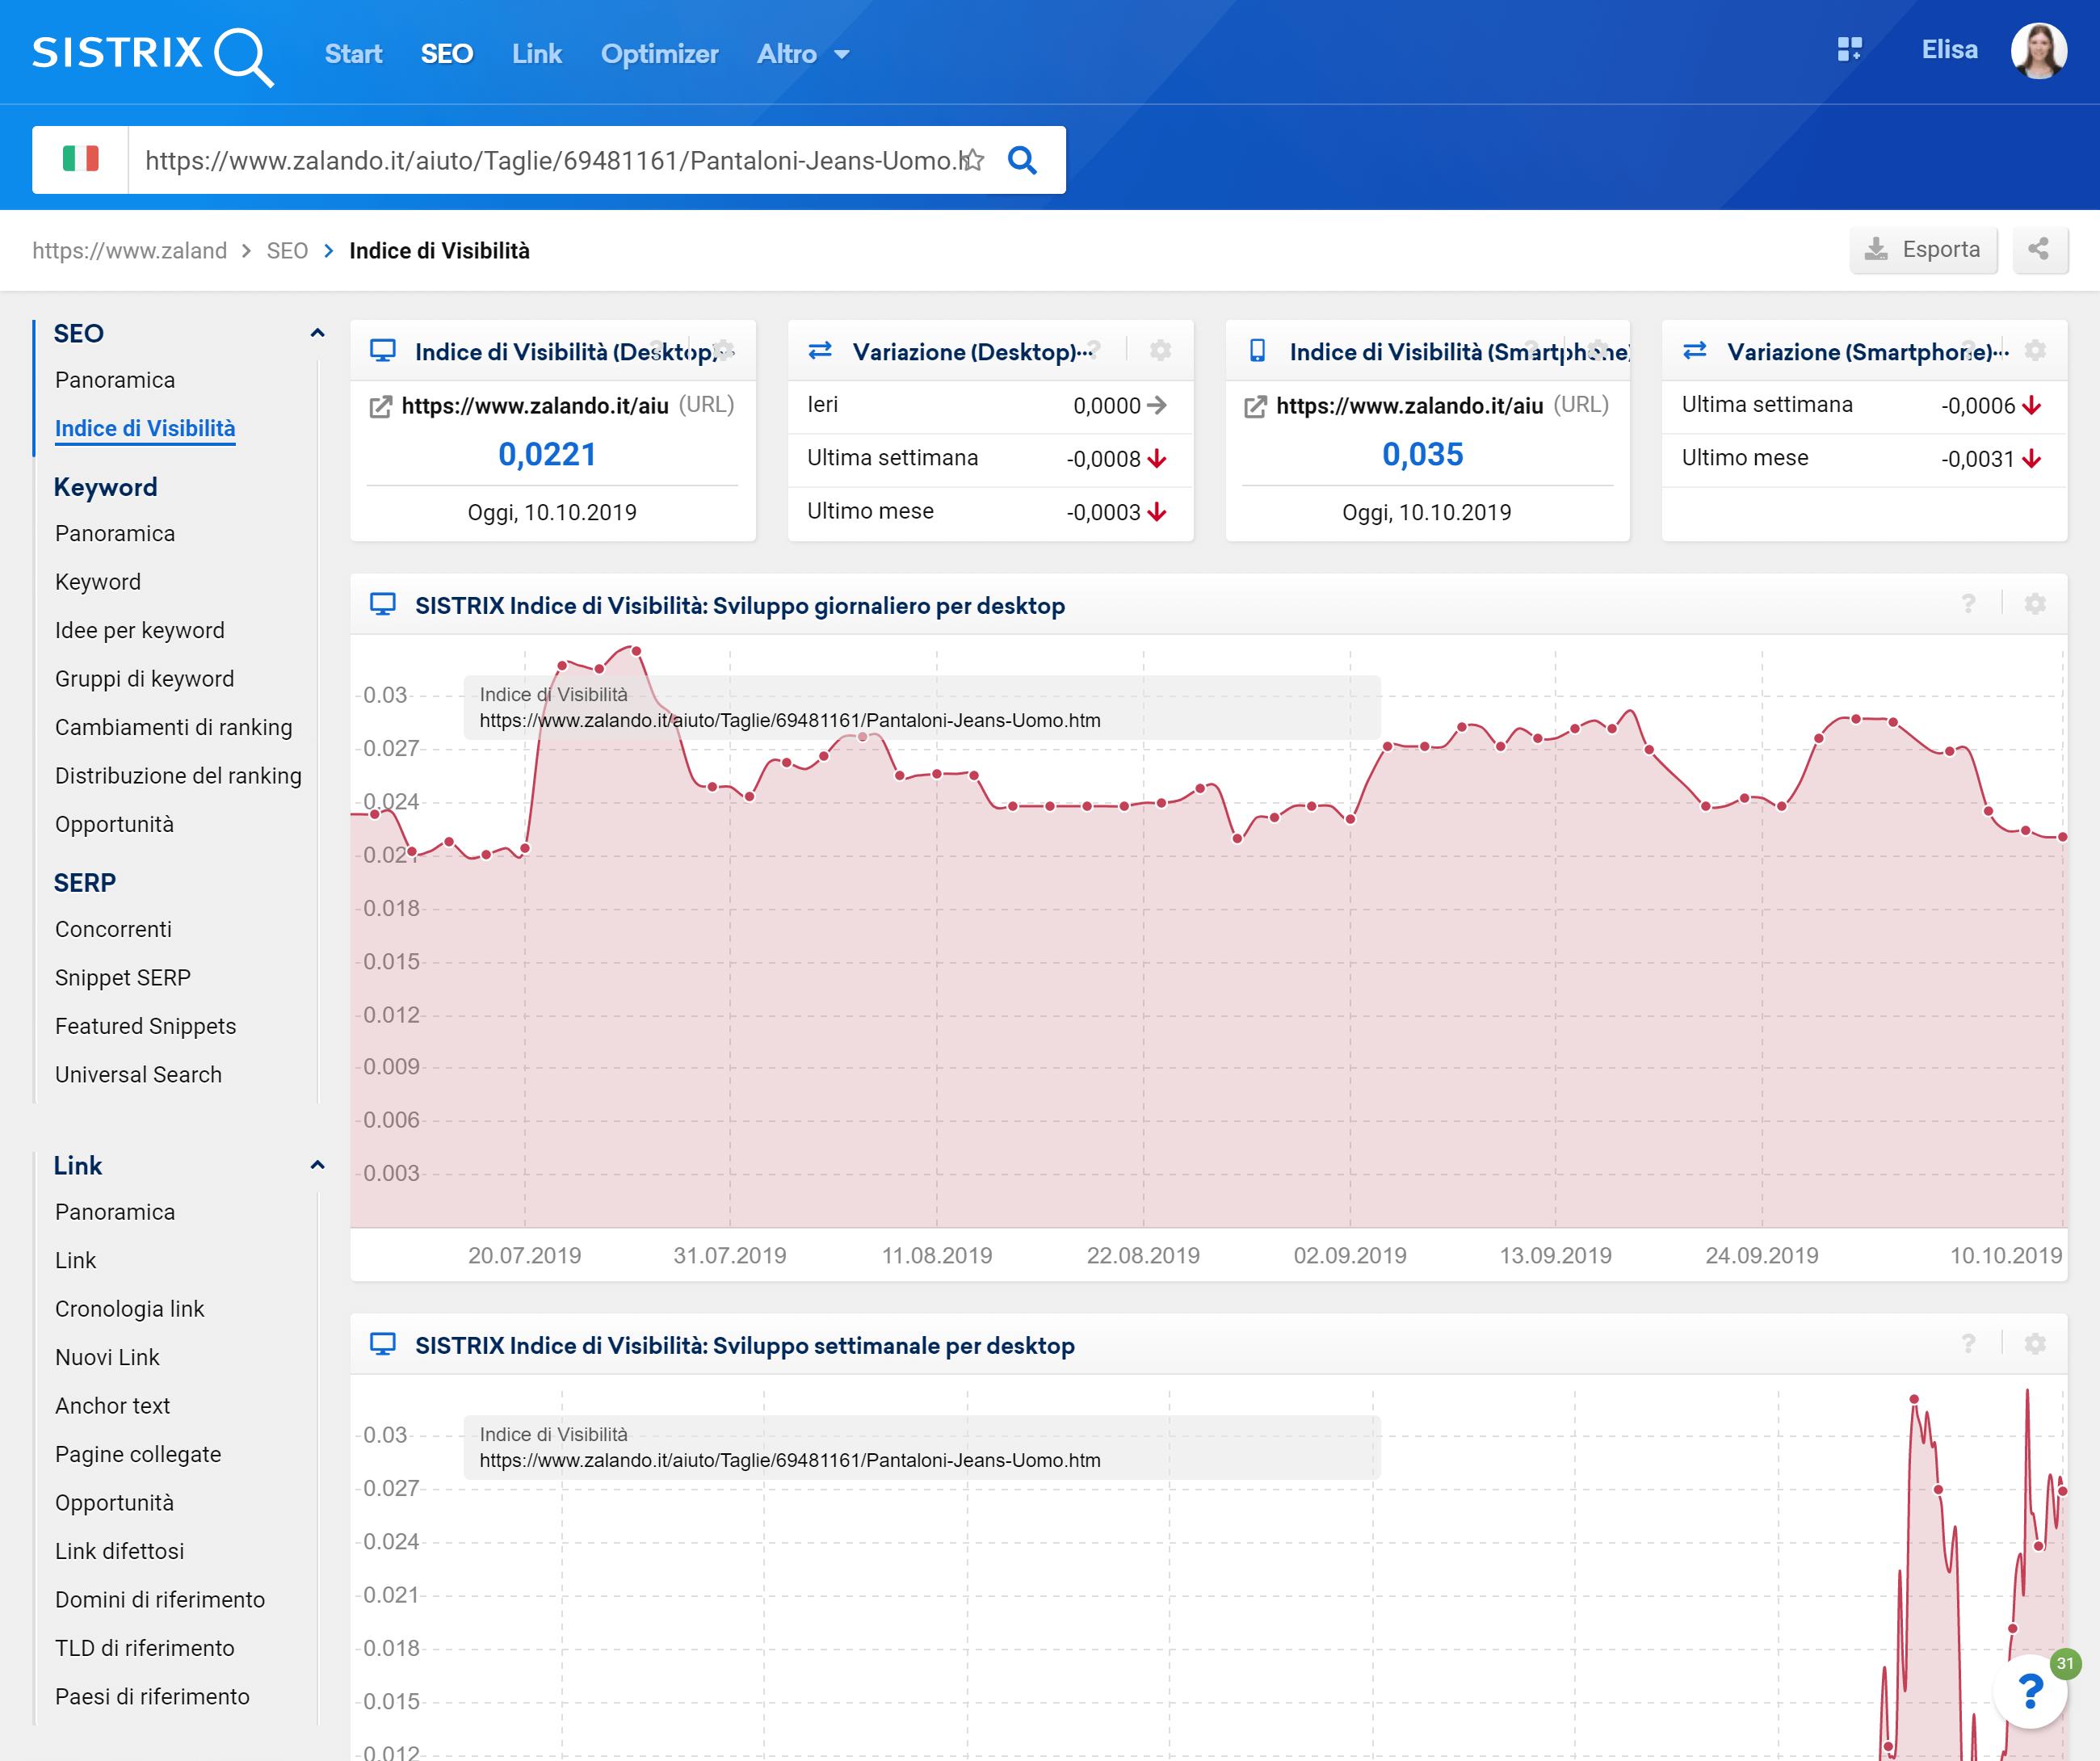 Toolbox SISTRIX: indice di visibilità del singolo URL